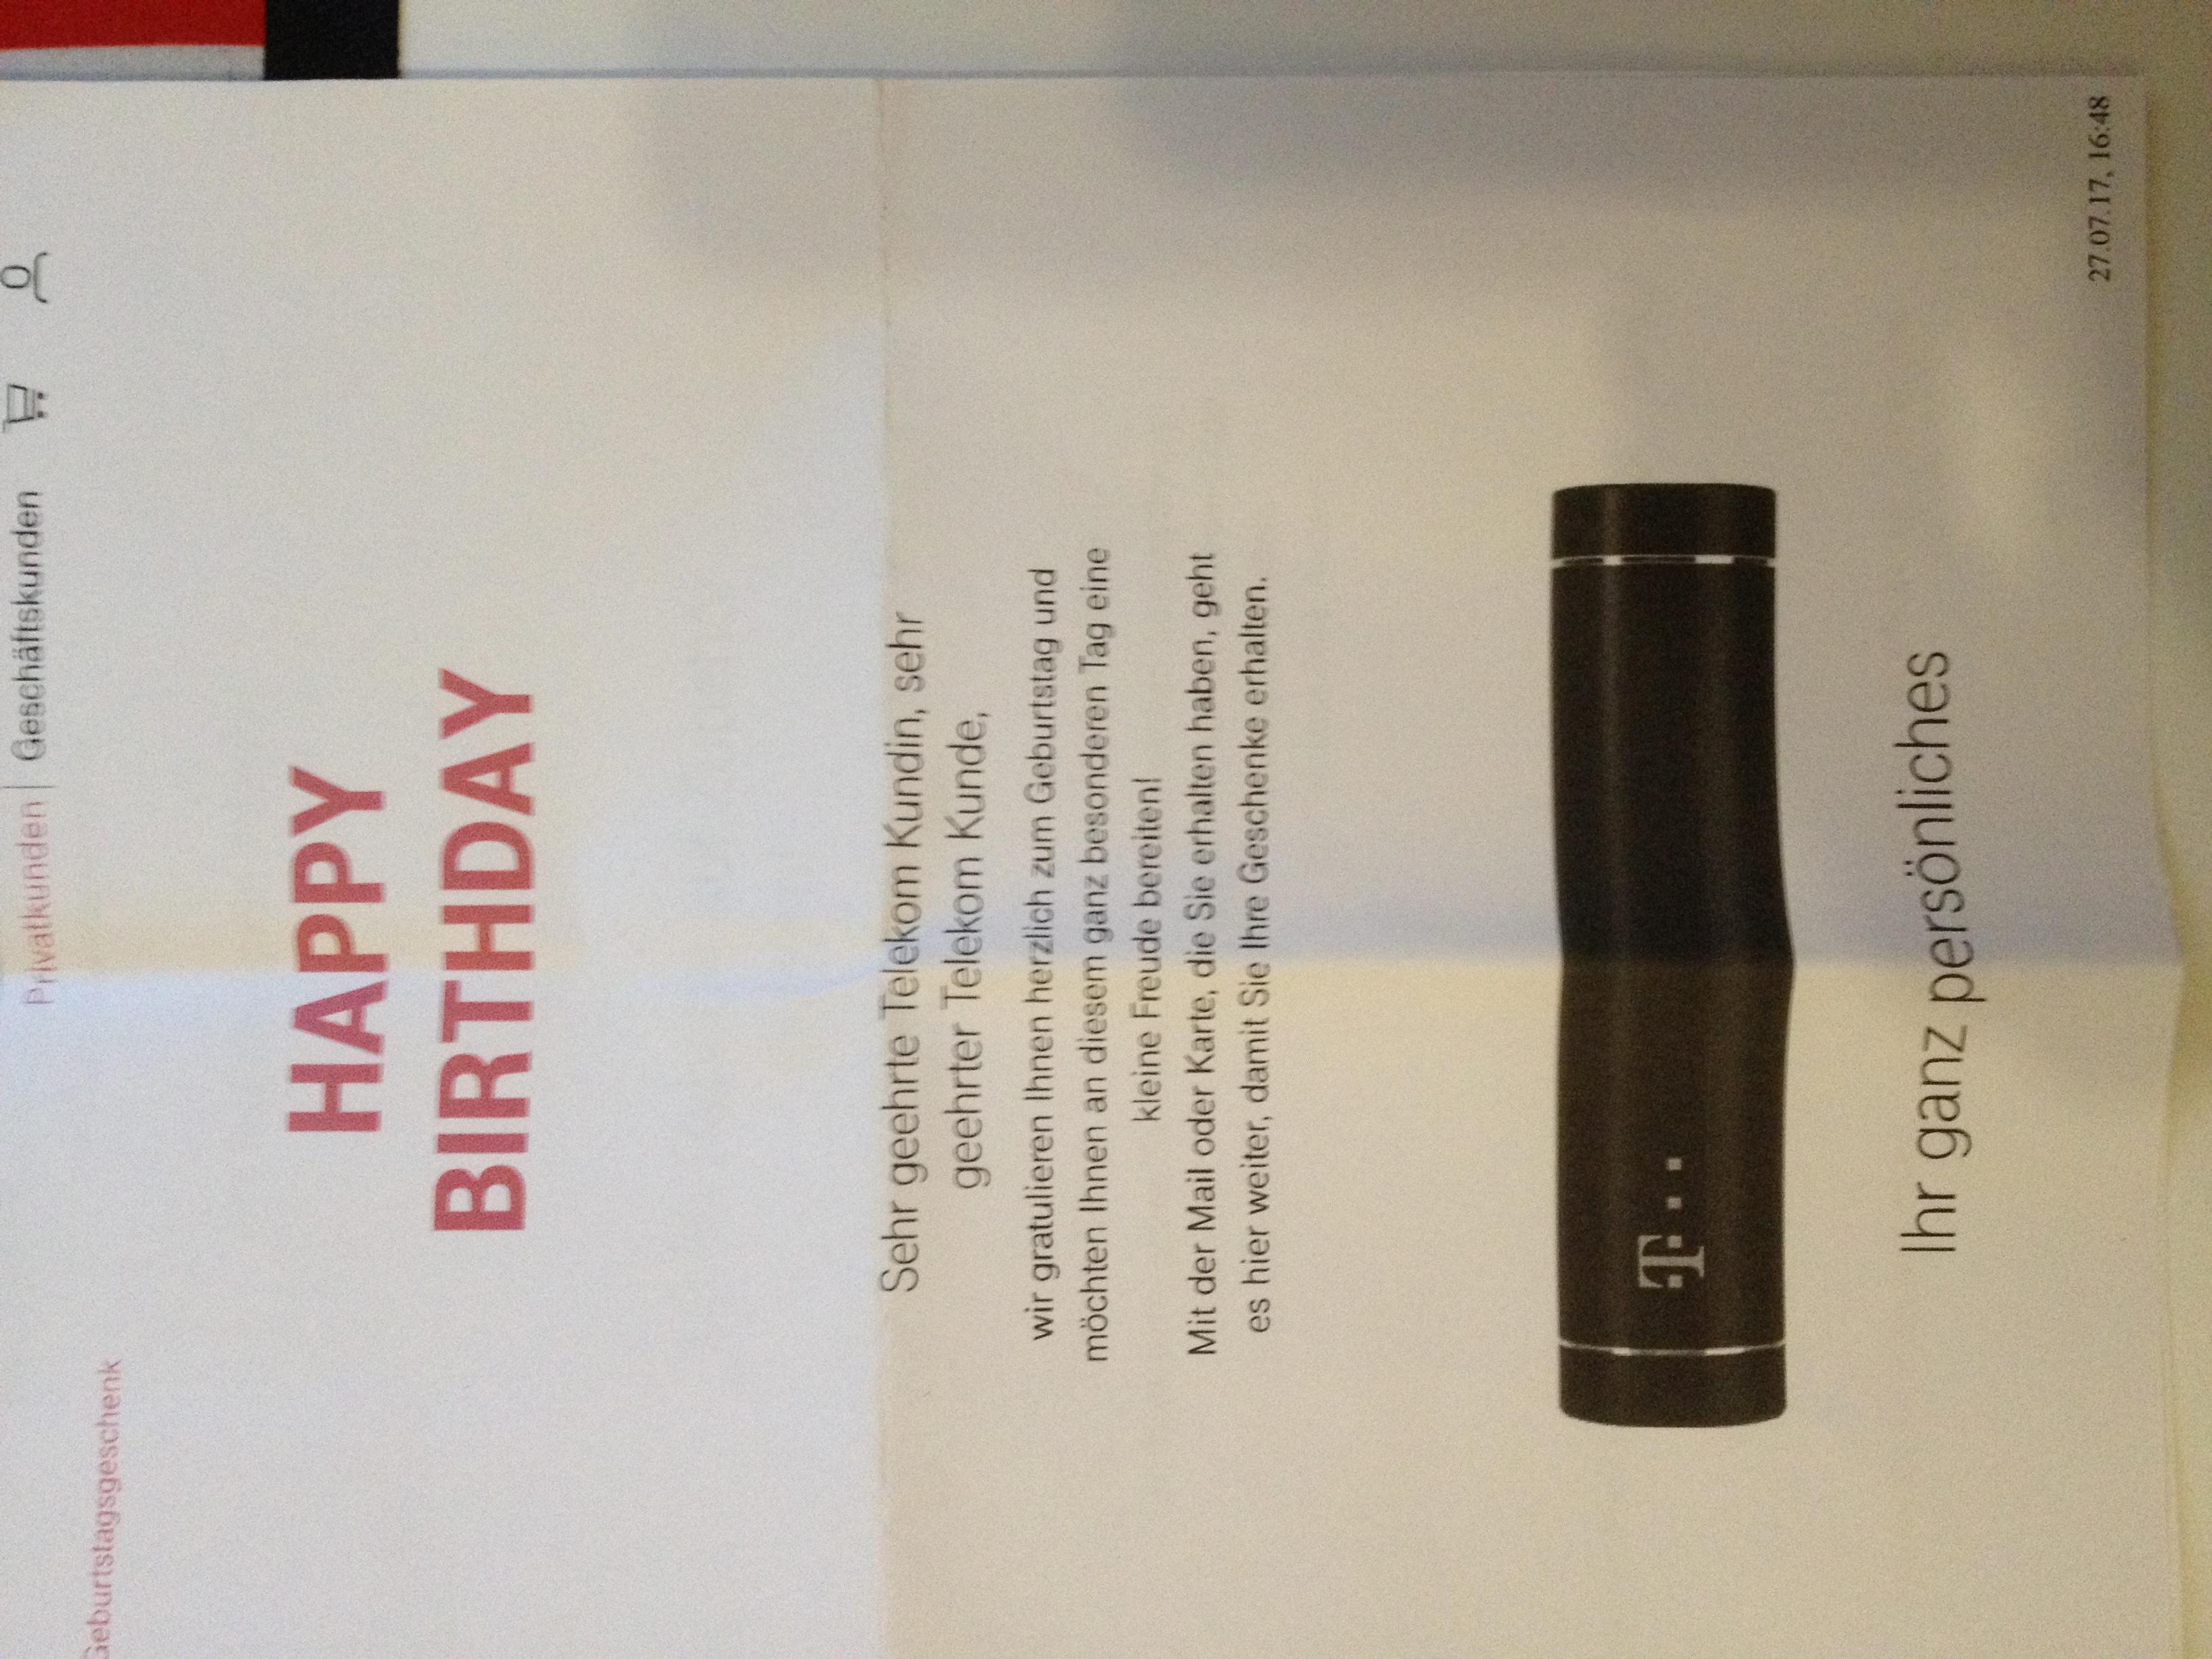 Community Wir Haben Als Geburtstagsgeschenk Die Powebank Bek